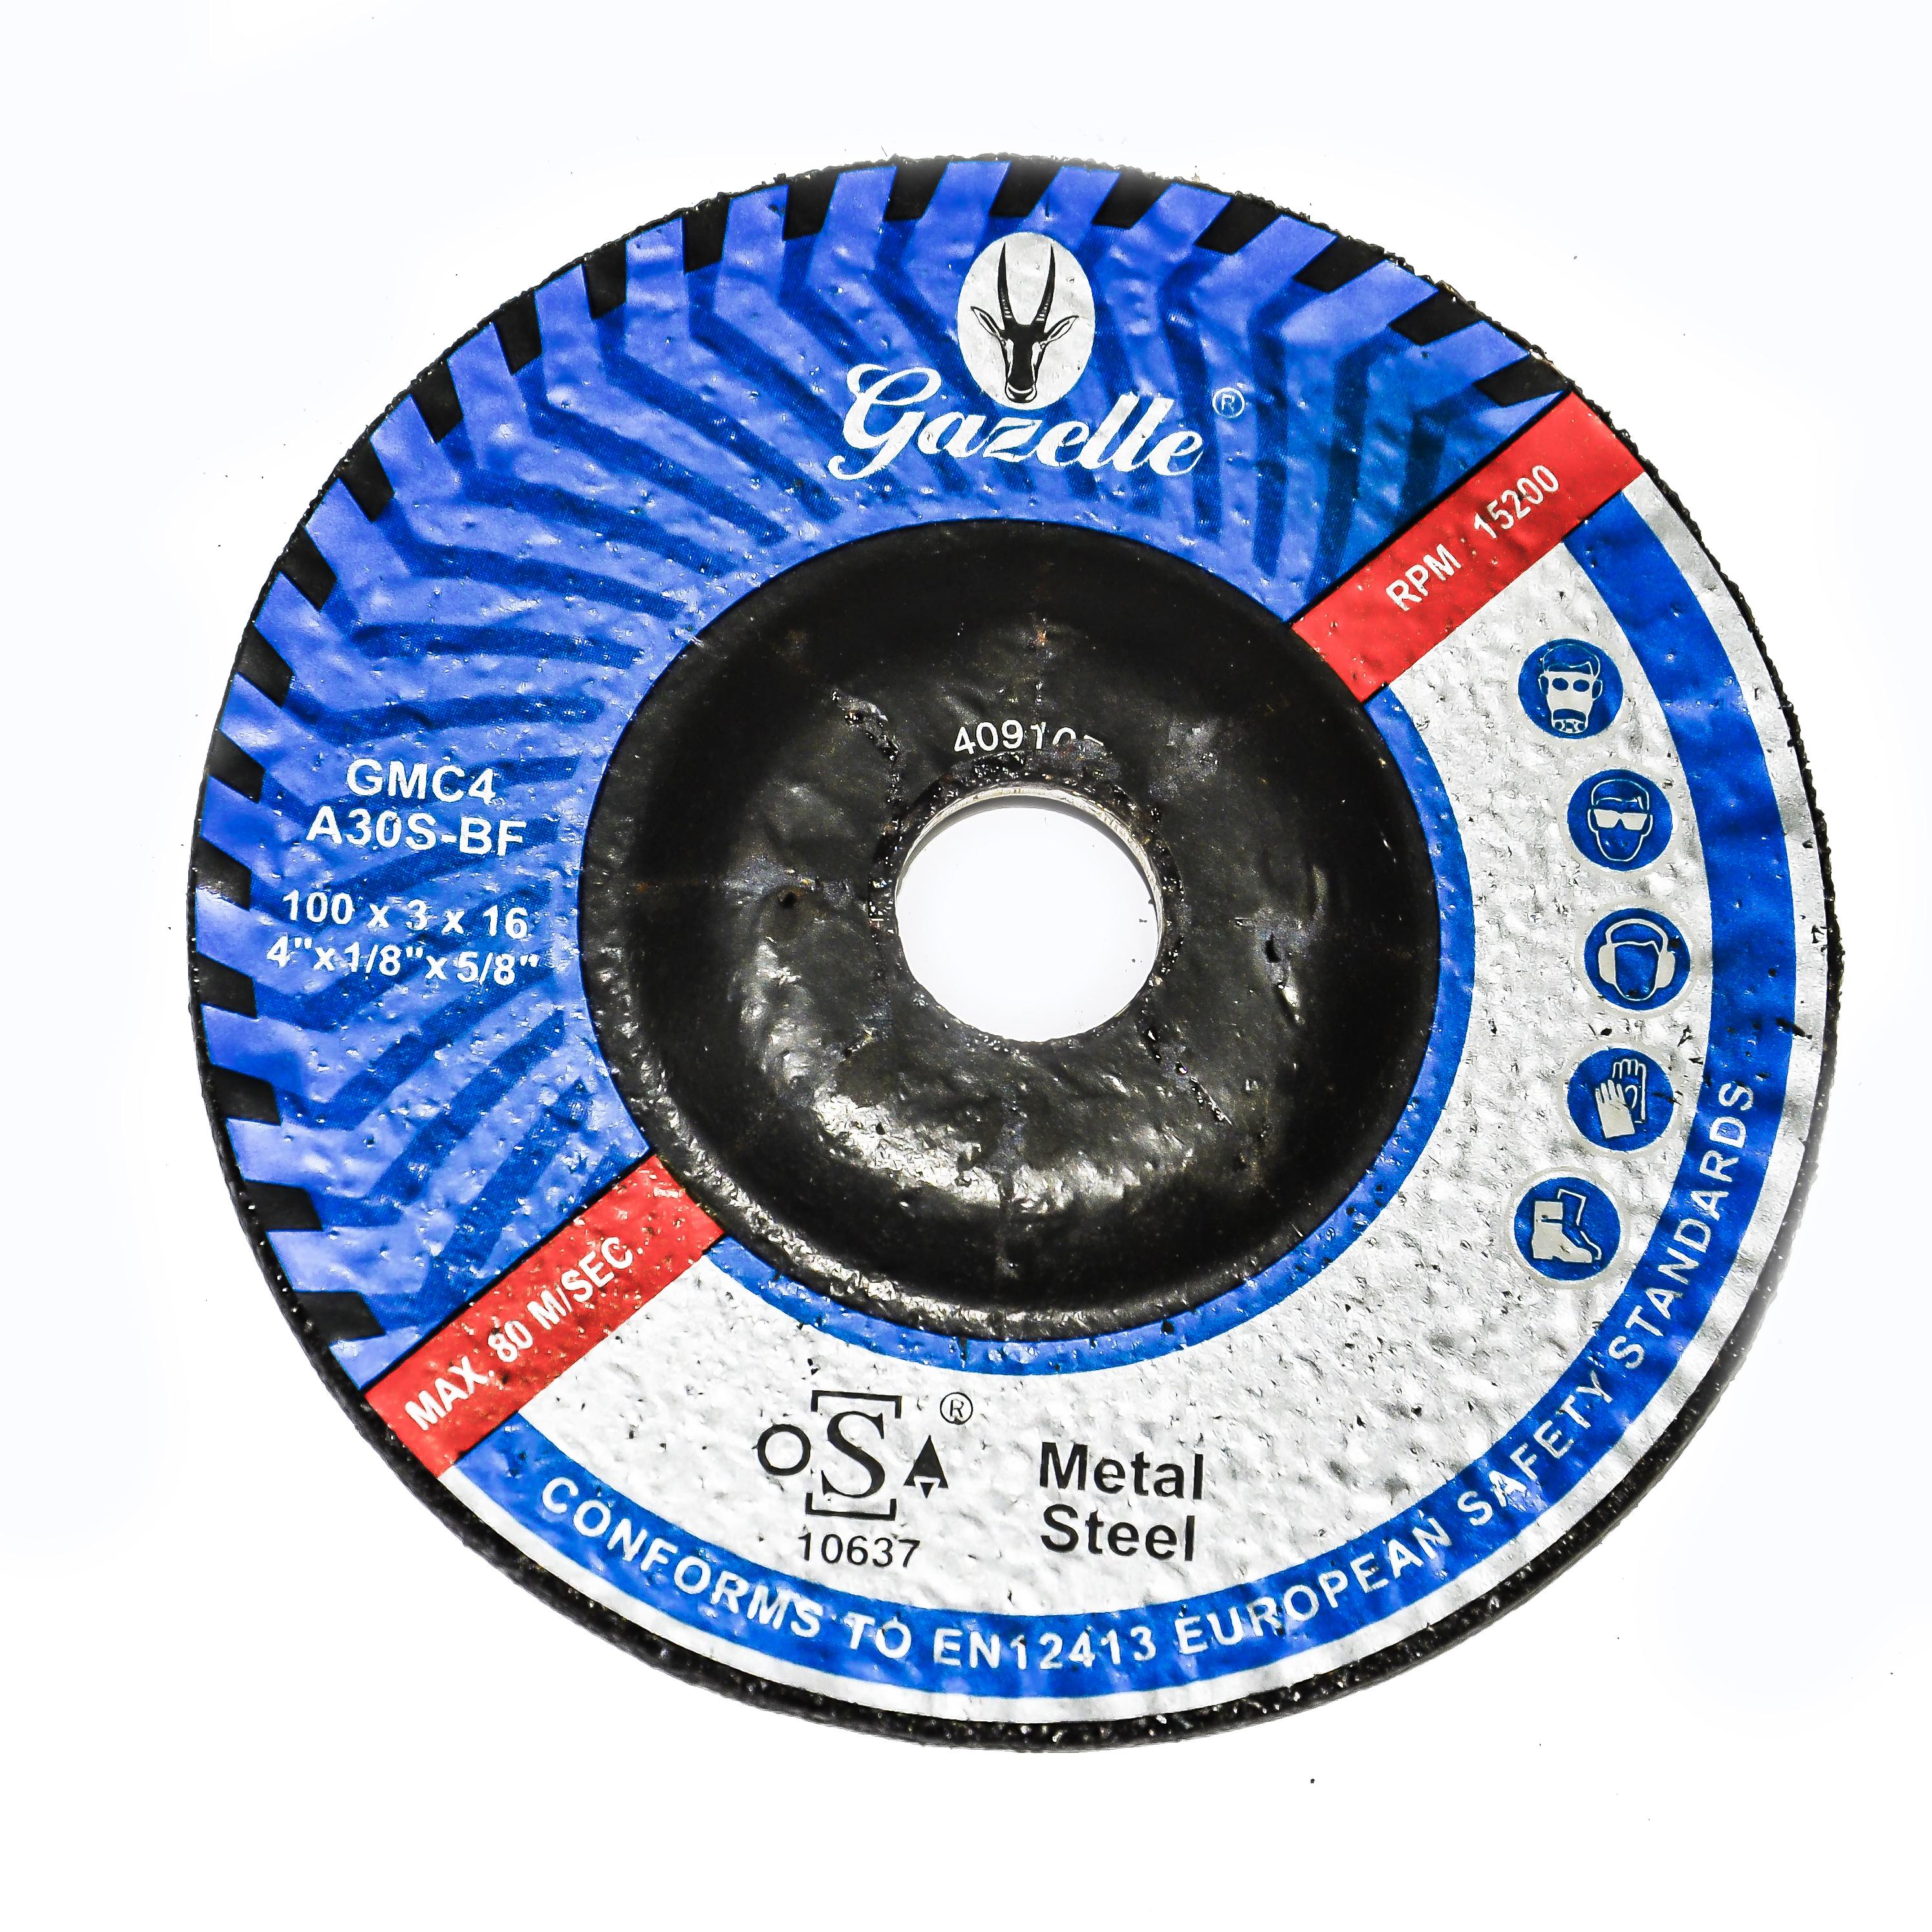 GAZELLE GMC4 - Metal Cutting Disc 4in – 100 x 3 x 16 mm